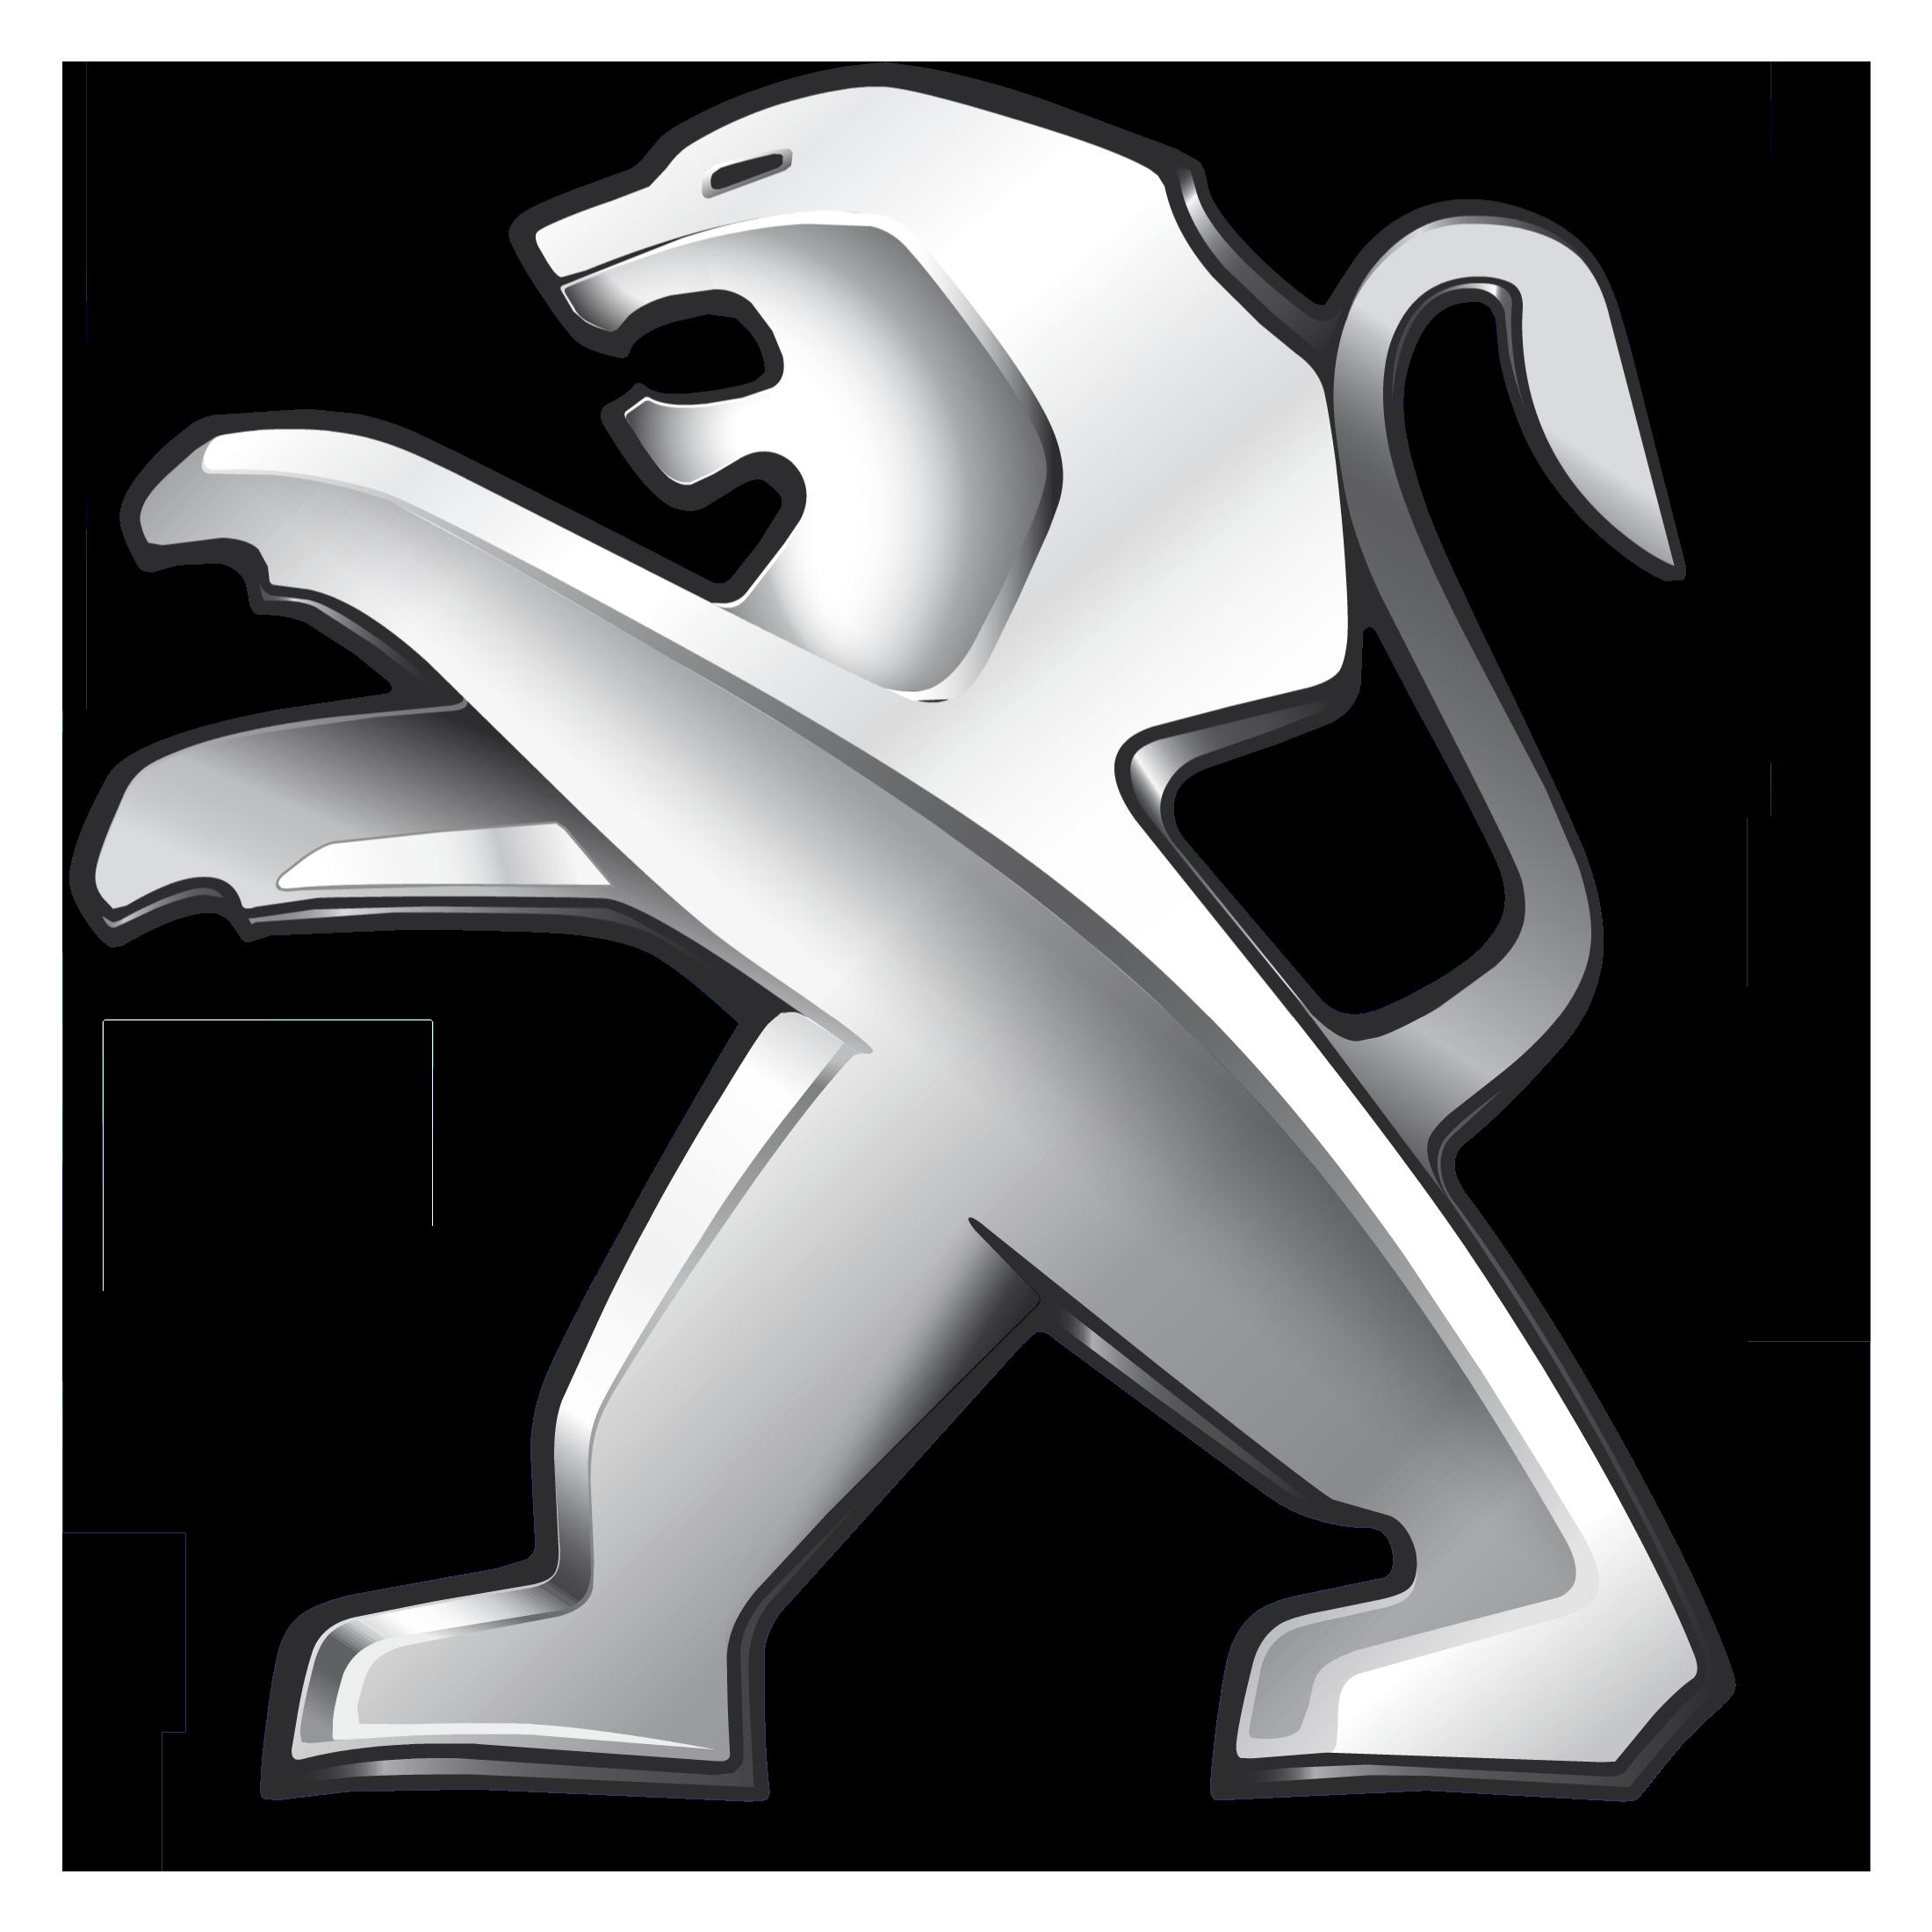 Peugeot Car Logo PNG Image